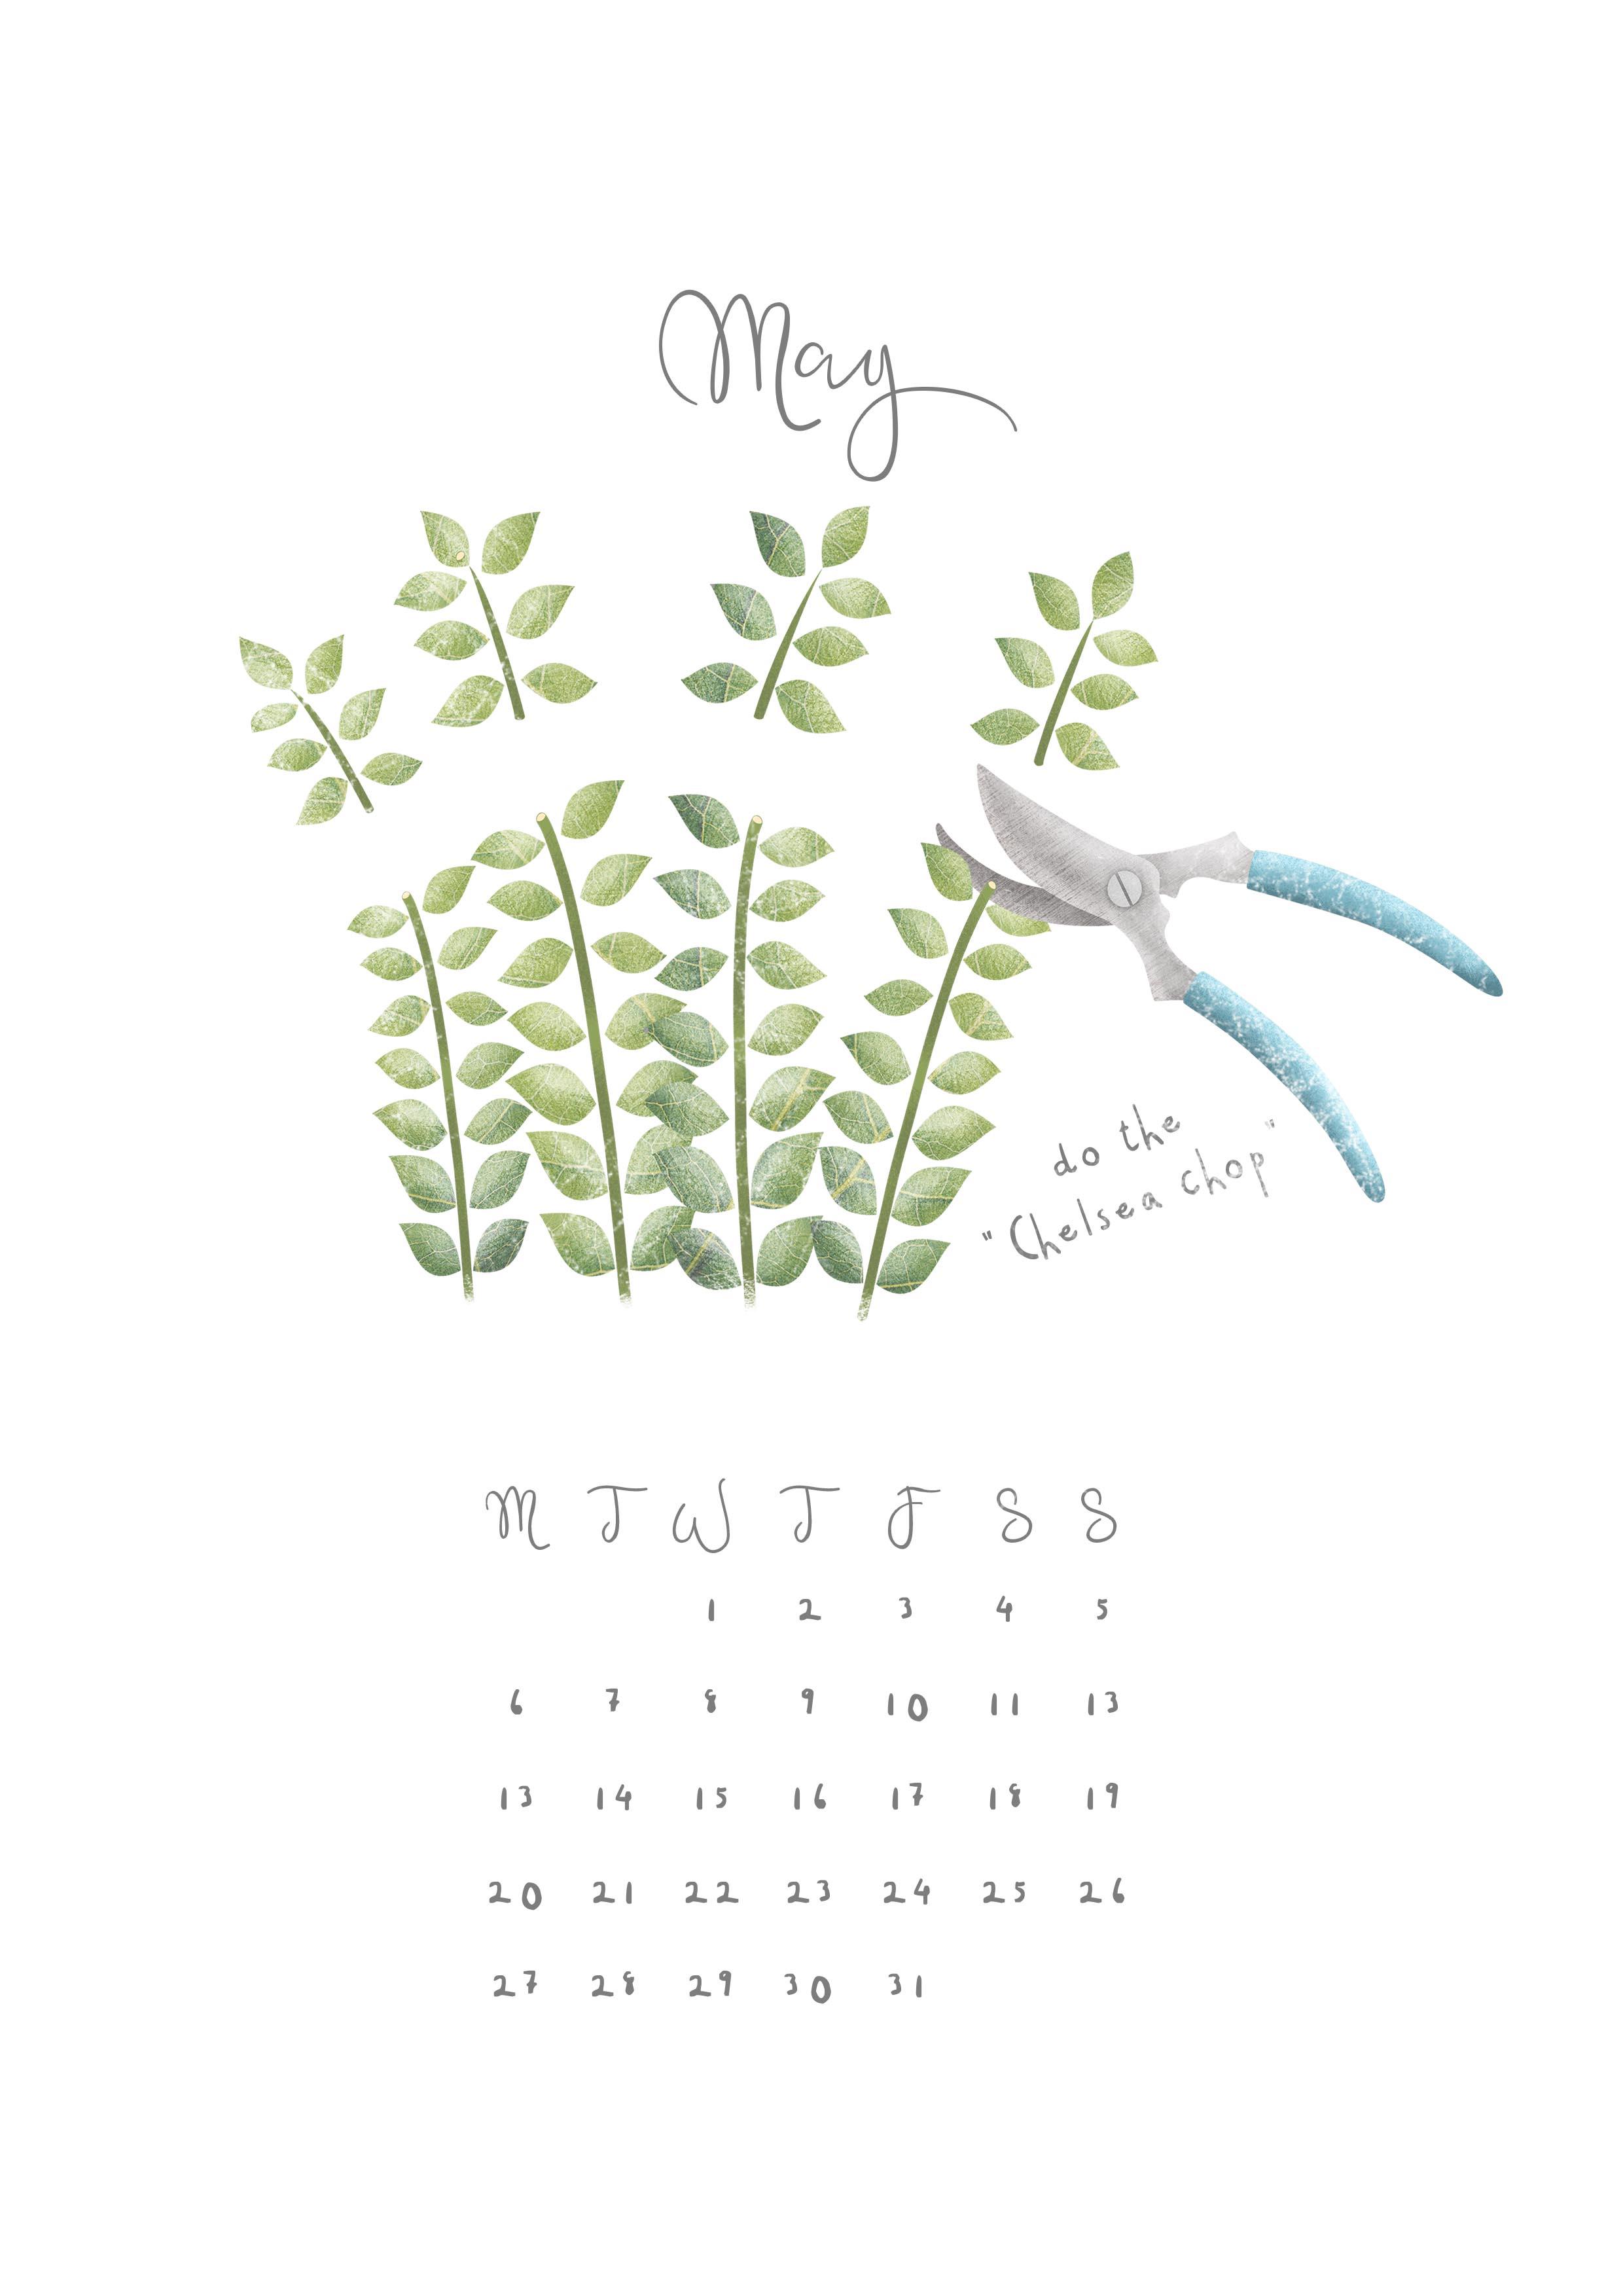 Hannah Weeks Illustration - May - Chelasea Chop - A4 copy.jpg